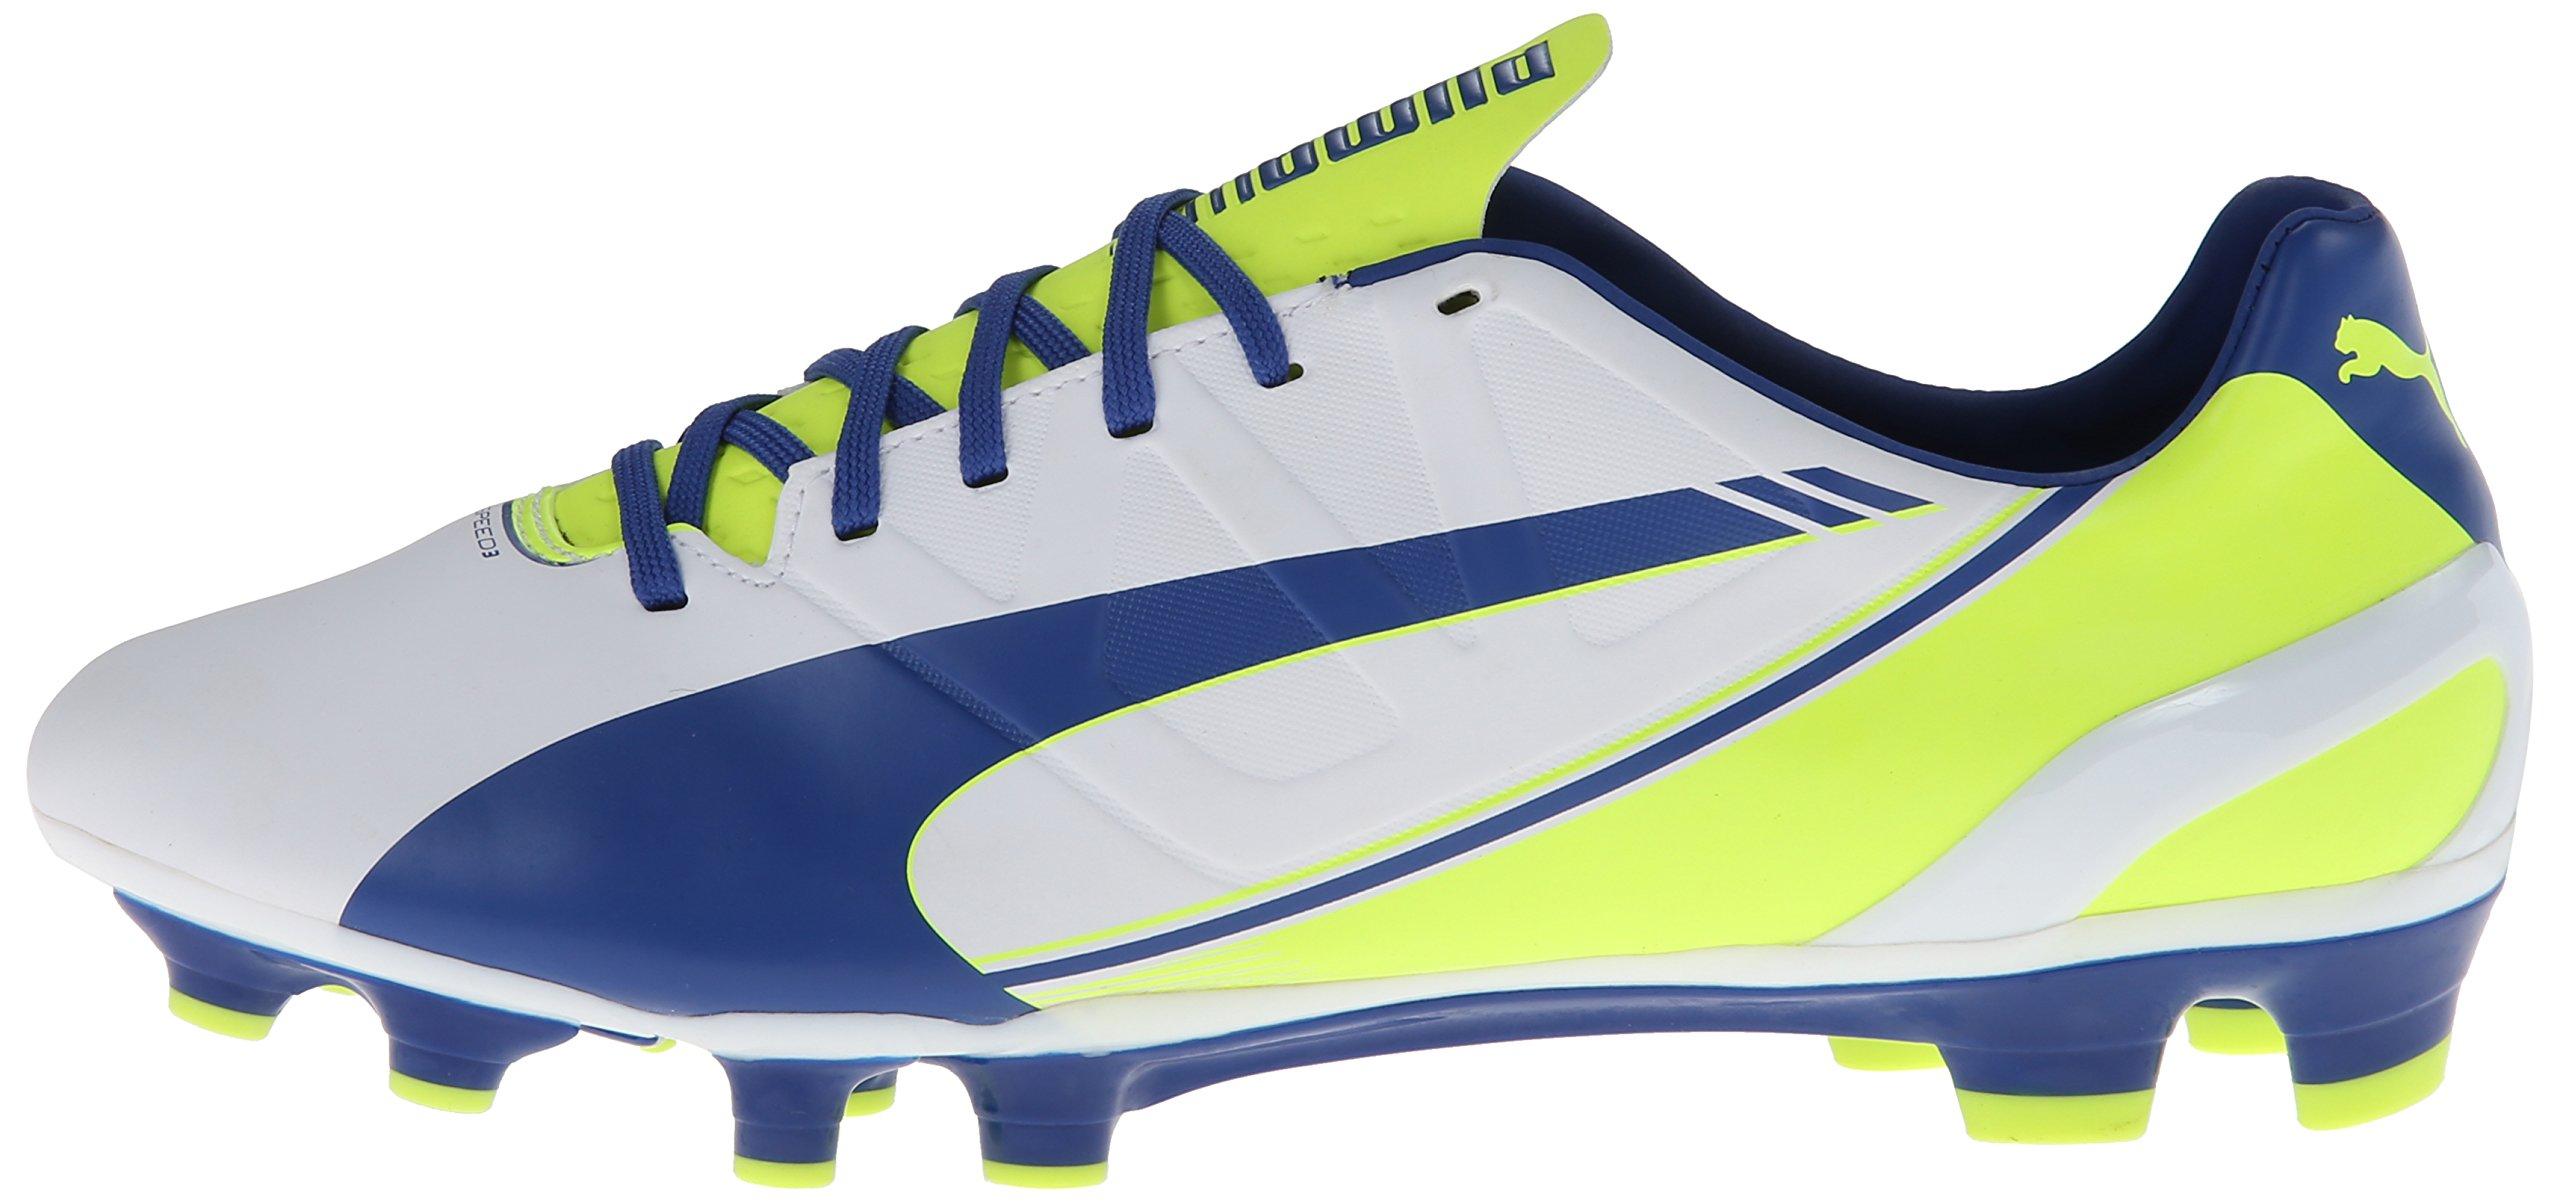 PUMA Women's Evo Speed 3.3 Firm Ground Soccer Shoe,White/Snorkel Blue/Fluorescent Yellow,8 B US by PUMA (Image #5)